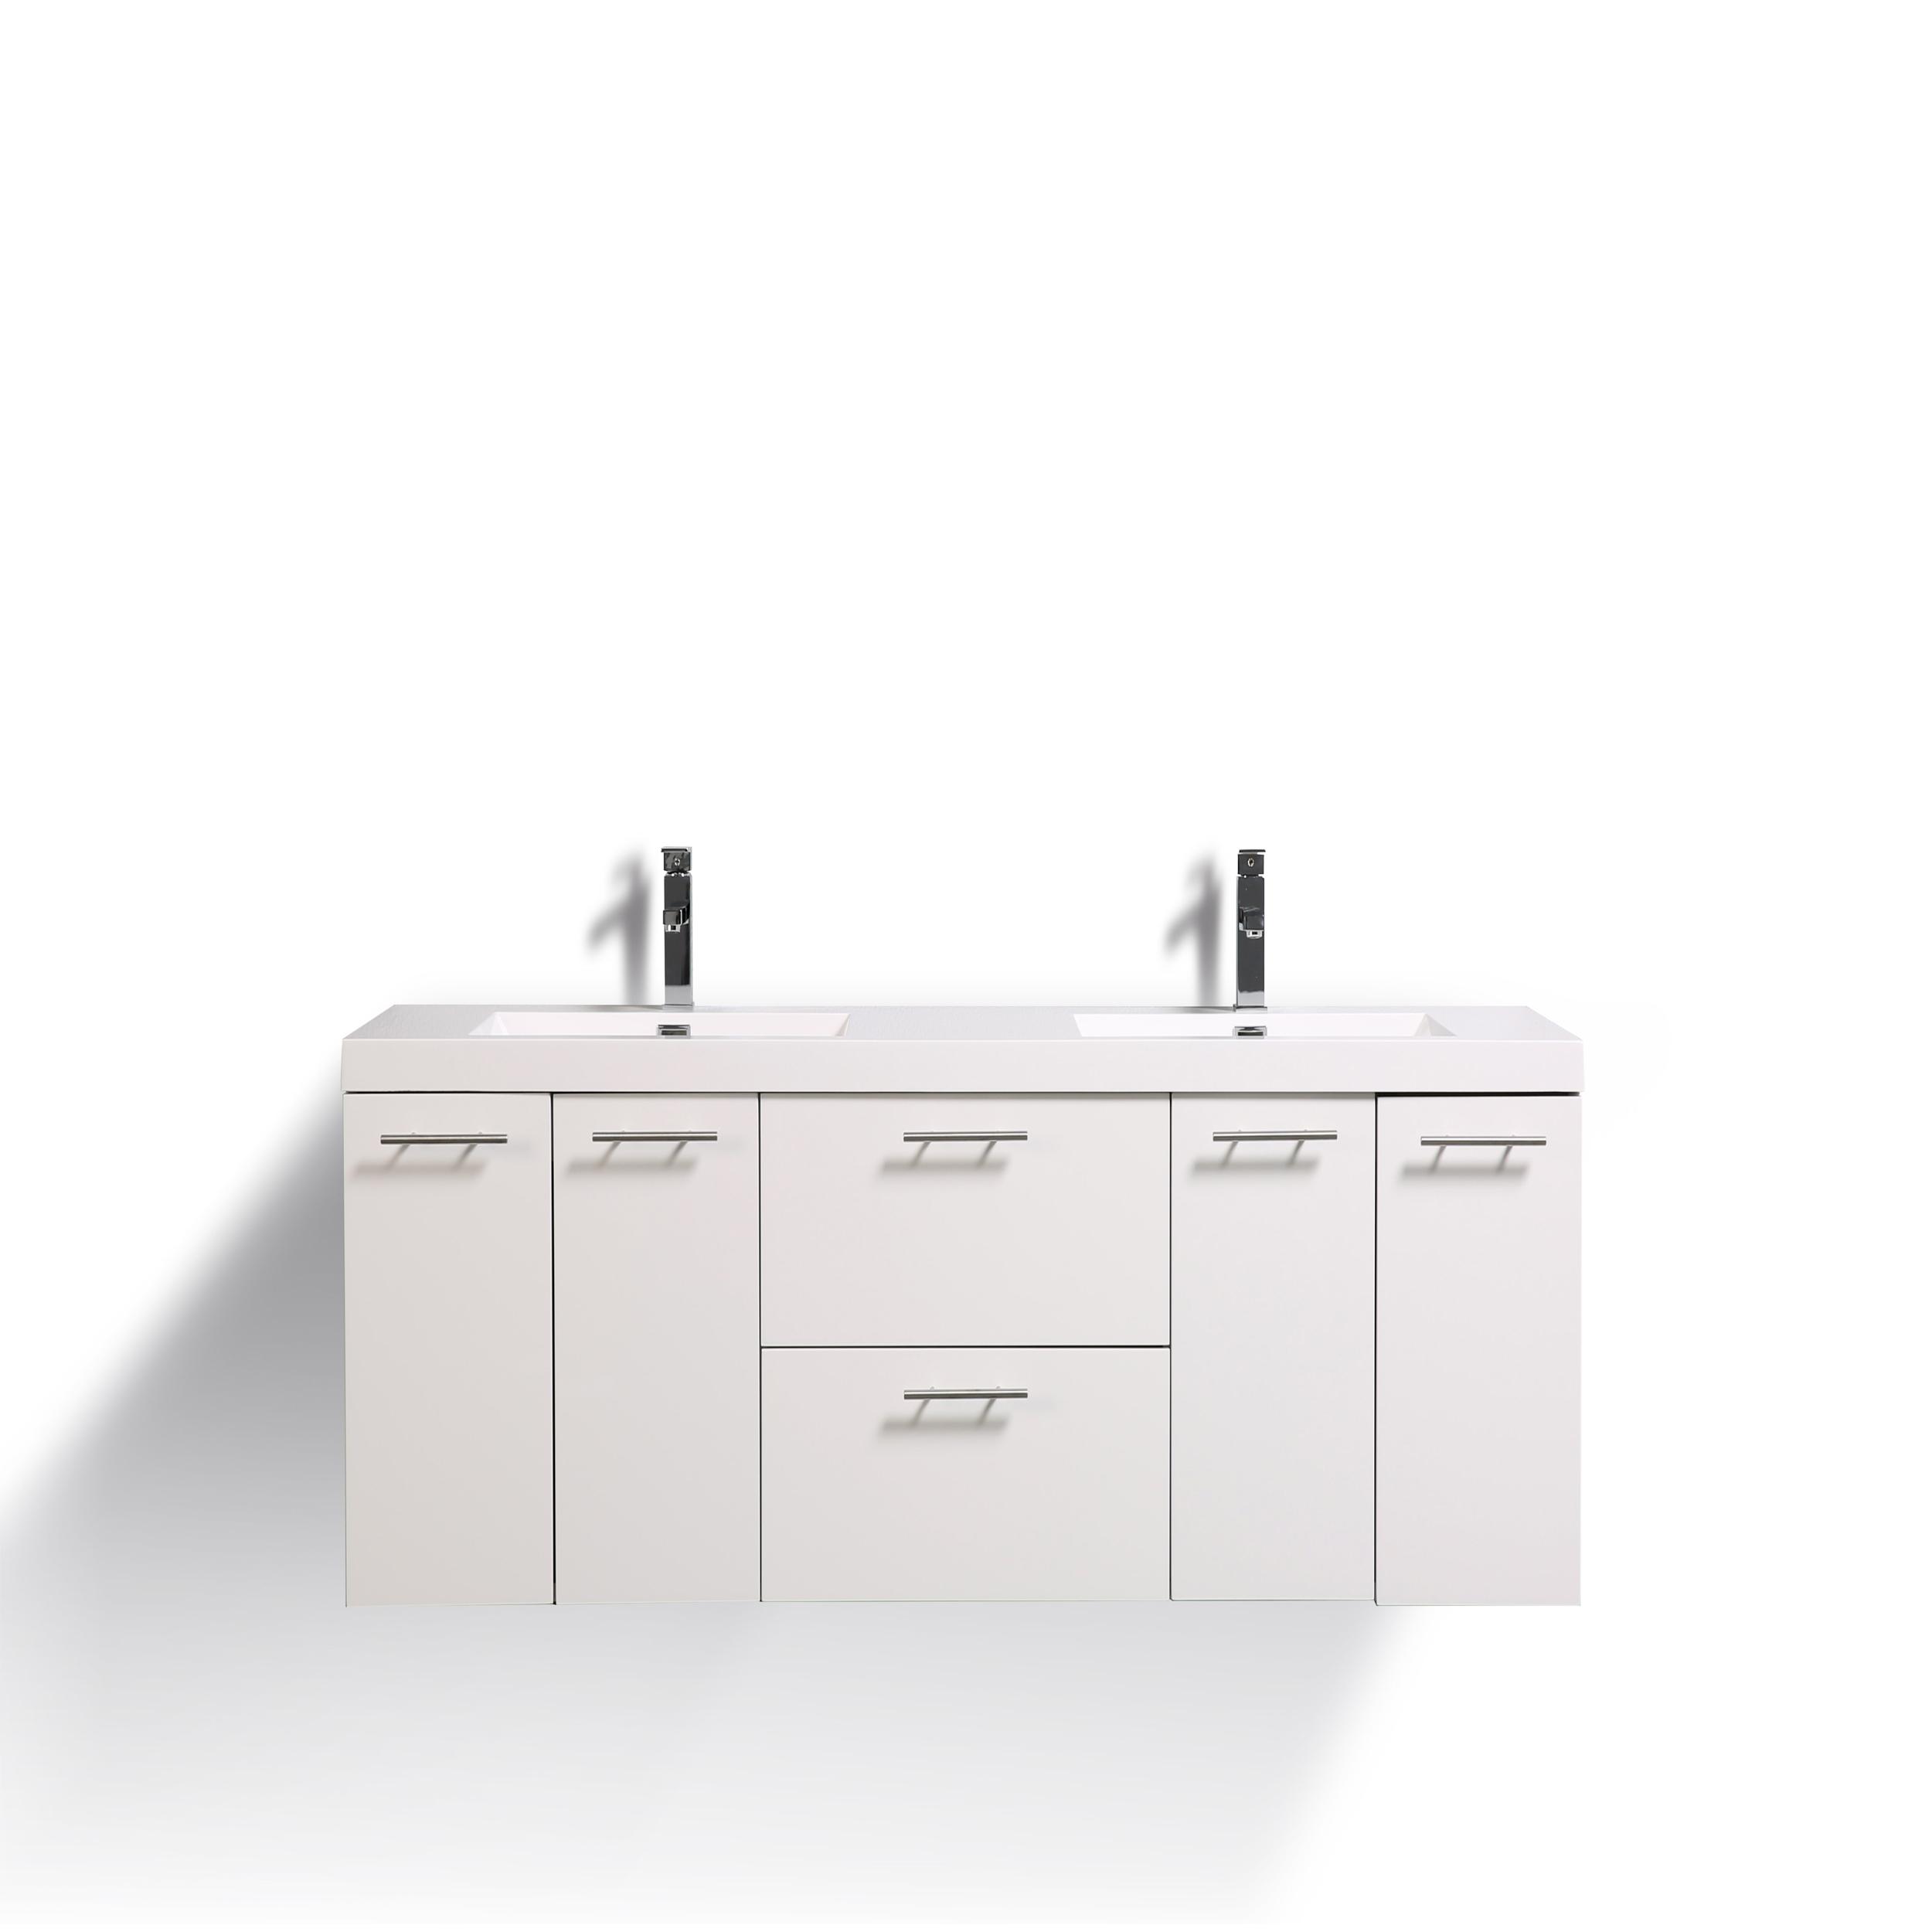 Eviva Luxury 72 inch White bathroom vanity with integrated acrylic sinks